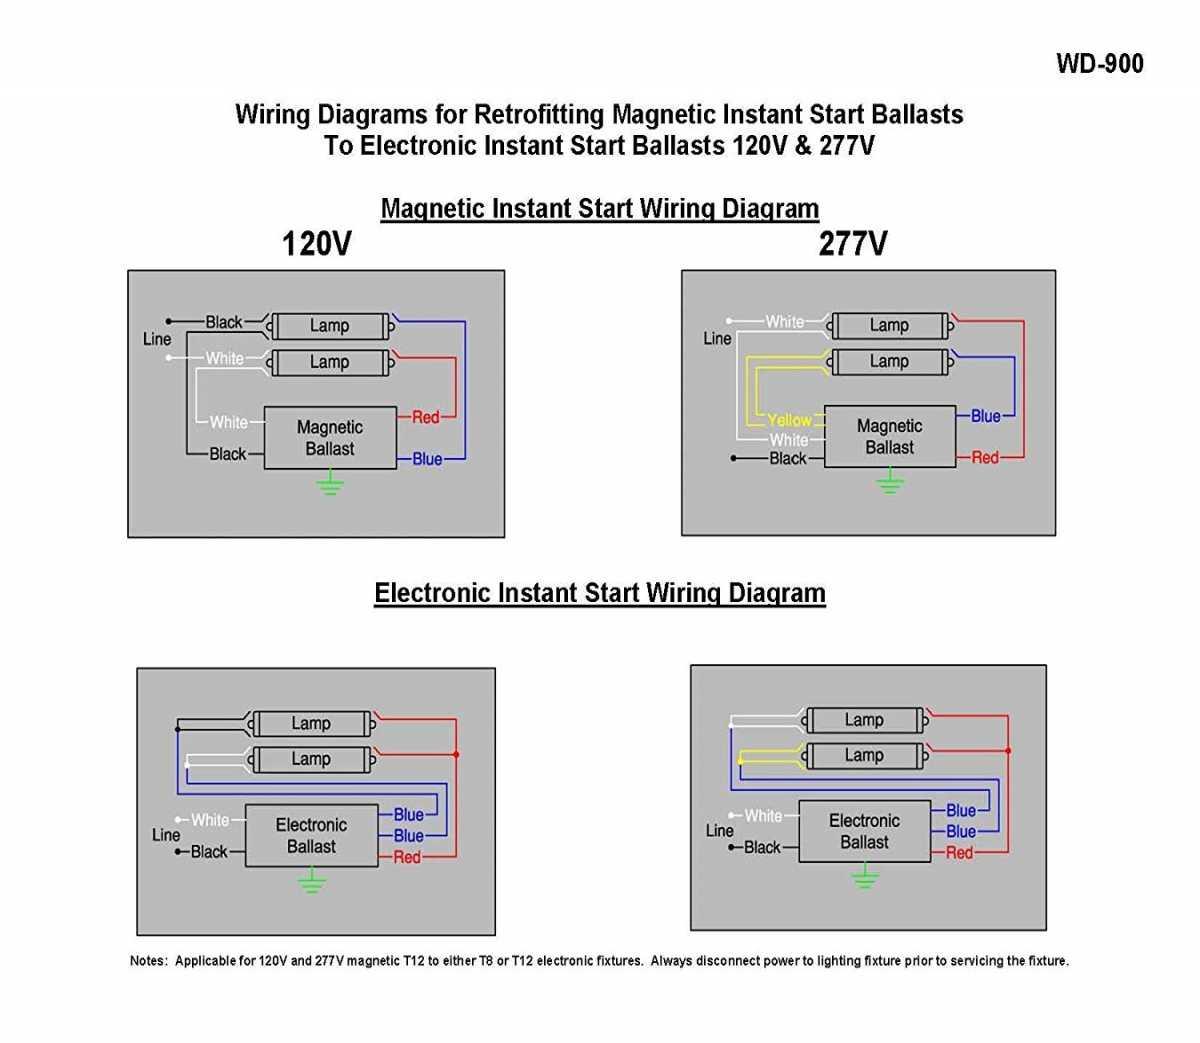 Universal Ballast Wiring Diagrams | Wiring Diagram - 2 Lamp T12 Ballast Wiring Diagram